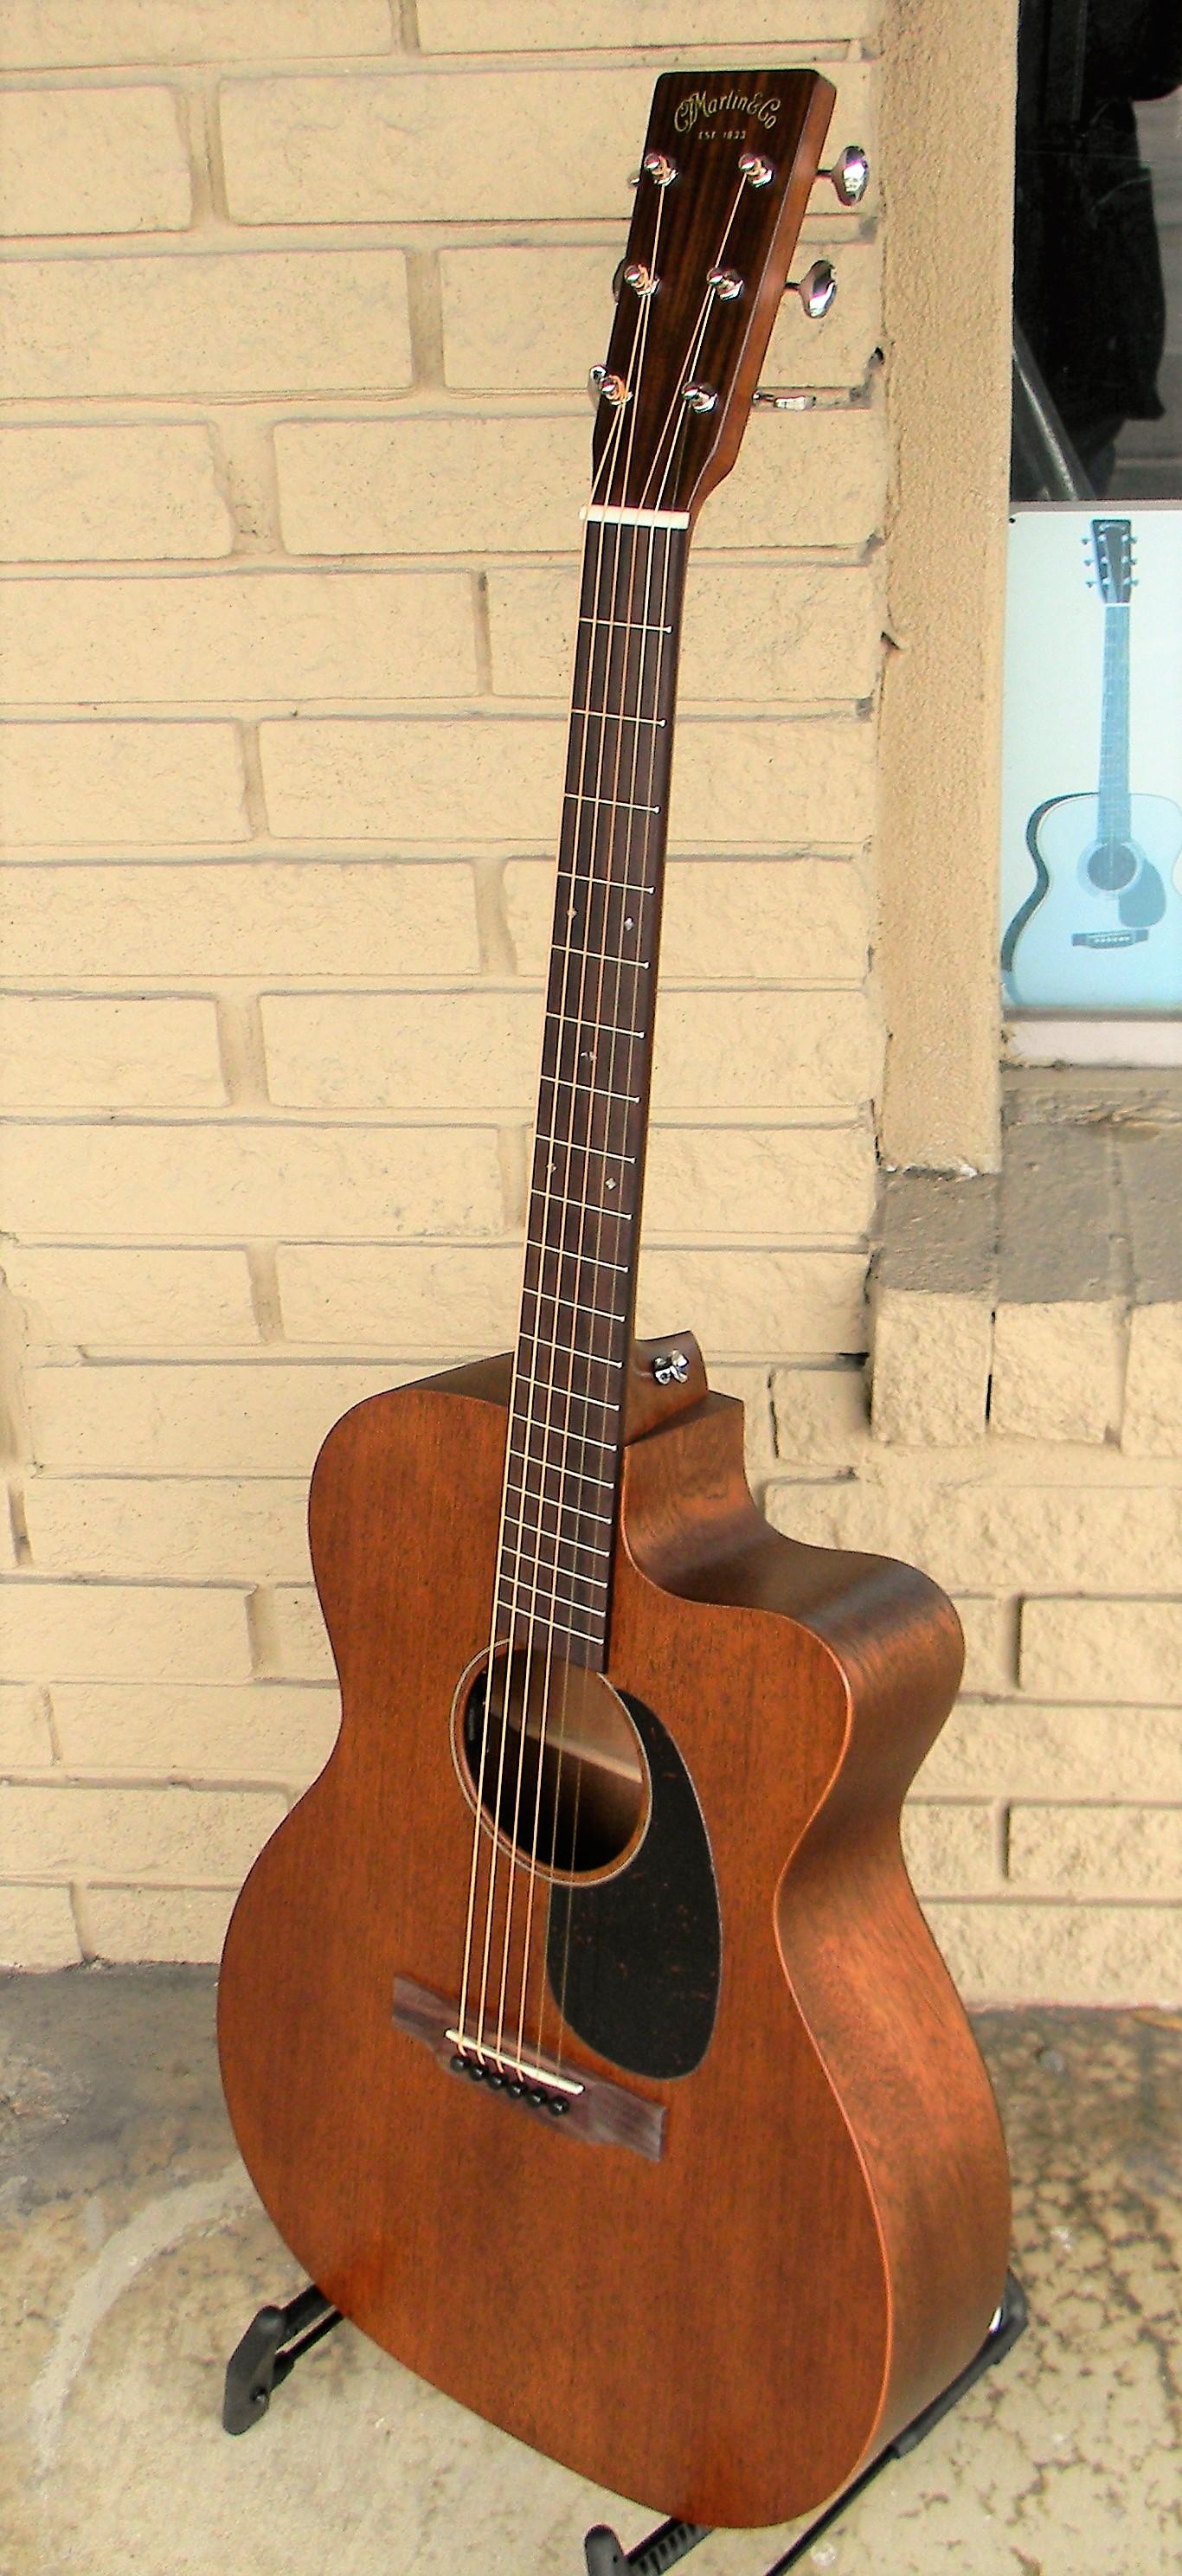 dscn6880 san antonio guitar store guitar tex. Black Bedroom Furniture Sets. Home Design Ideas